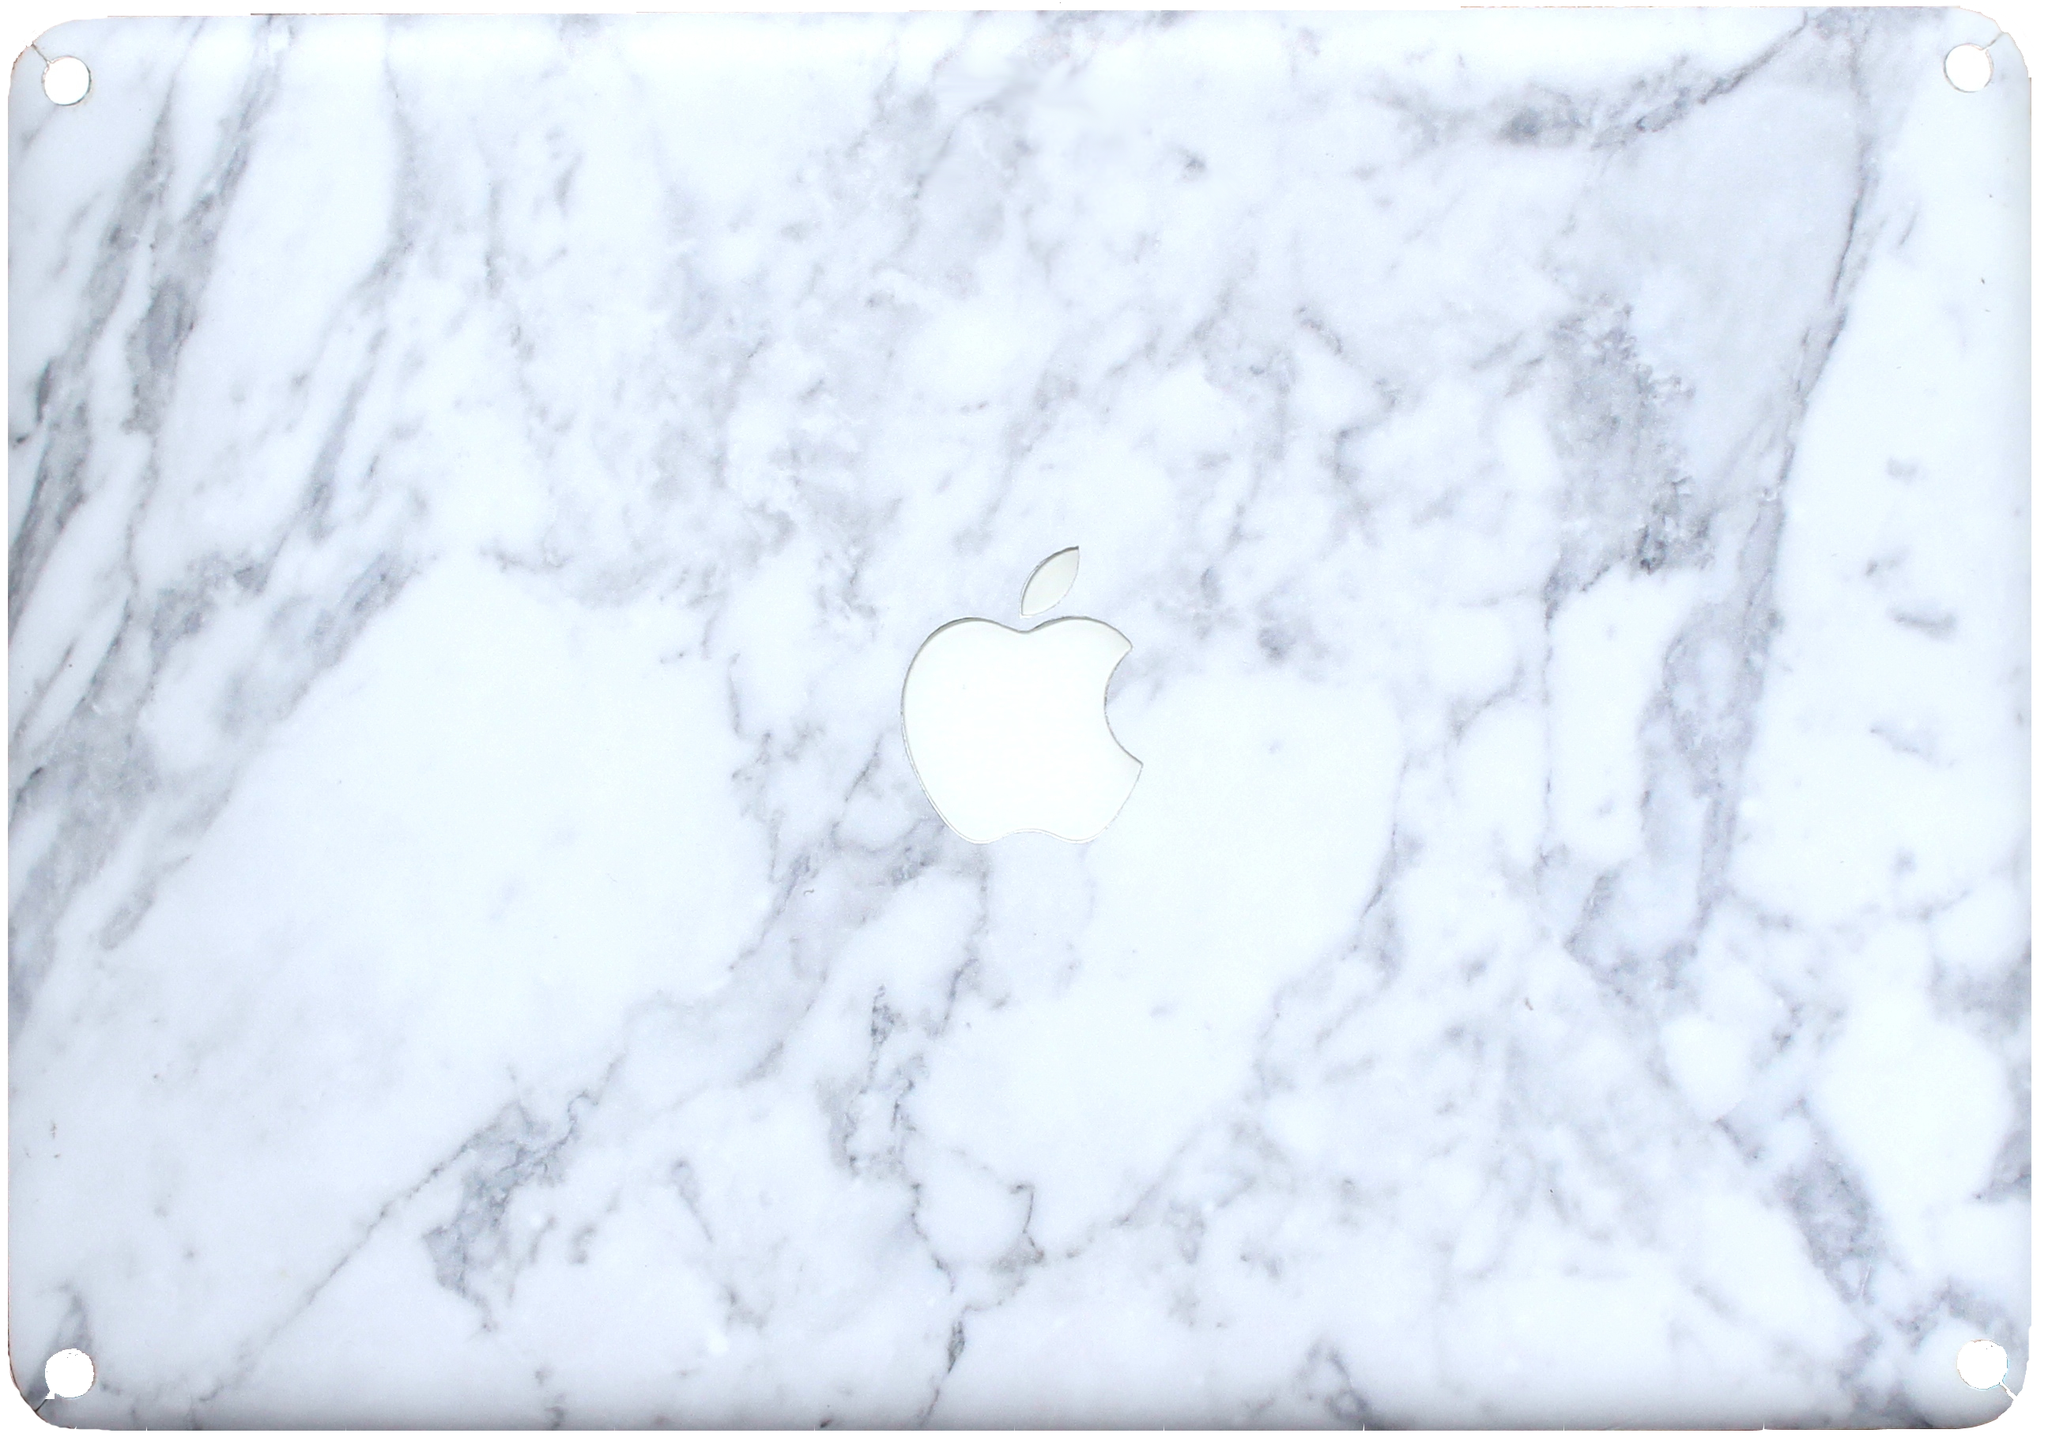 Marble MacBook Skin   Marble Mac by UNIQFIND